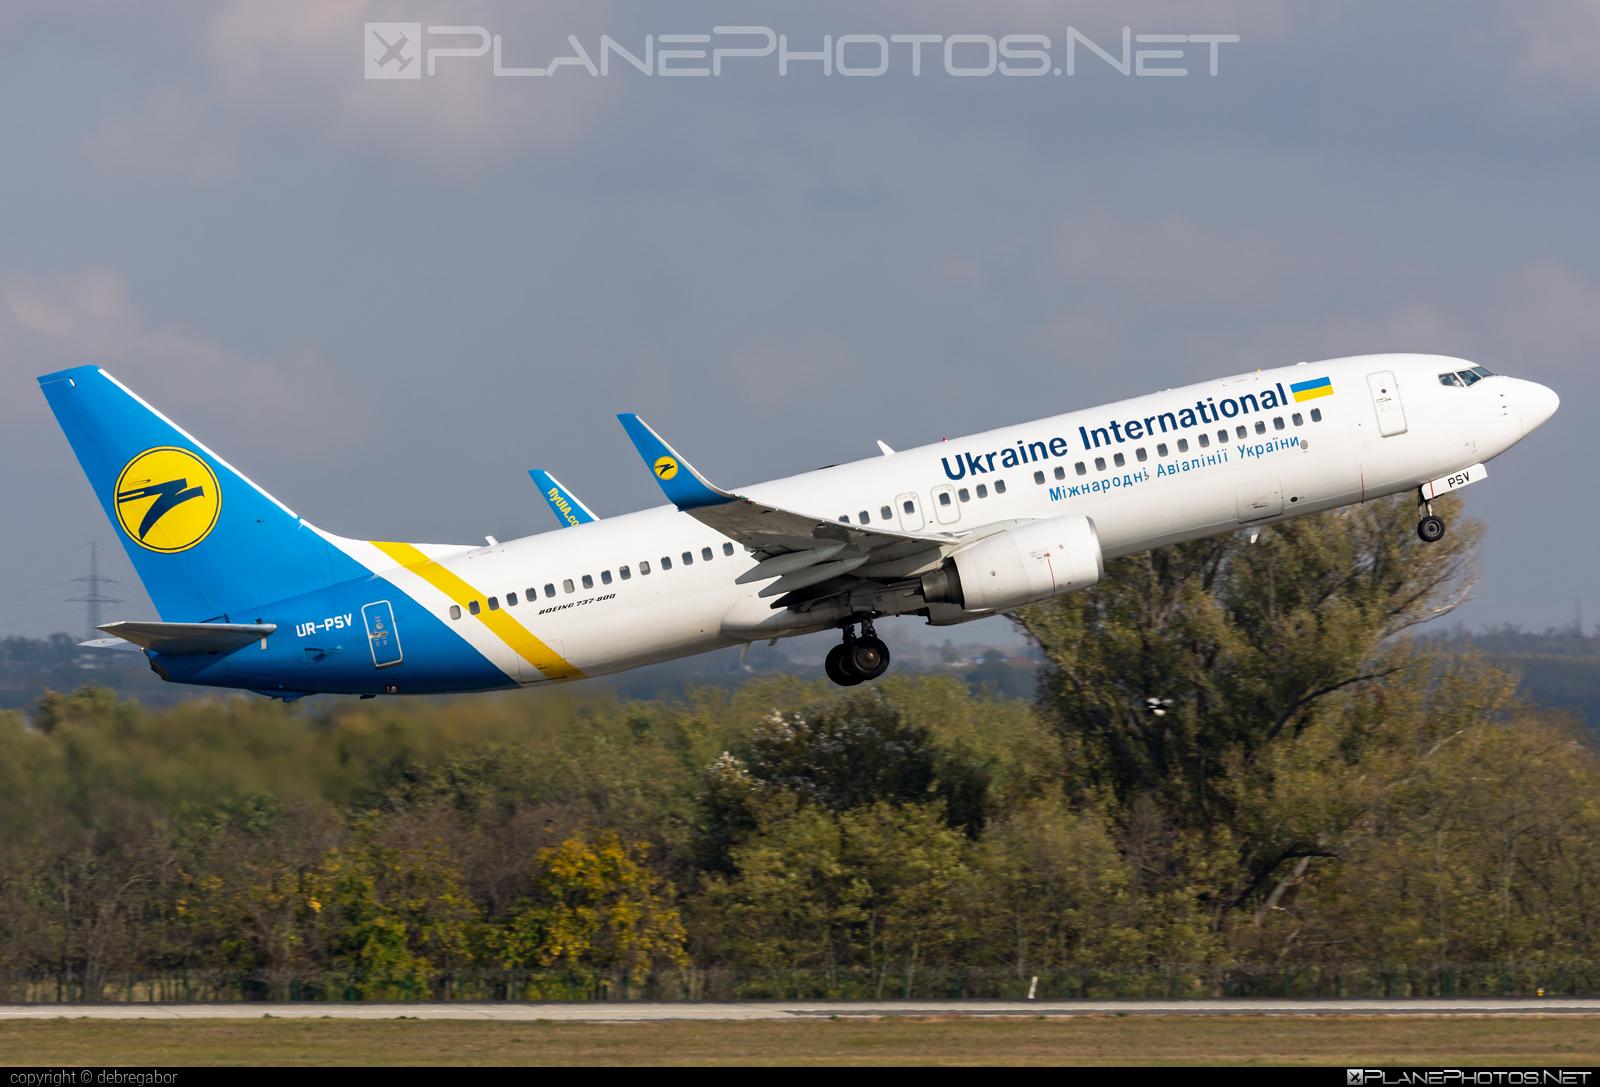 Boeing 737-800 - UR-PSV operated by Ukraine International Airlines #b737 #b737nextgen #b737ng #boeing #boeing737 #uia #ukraineinternationalairlines